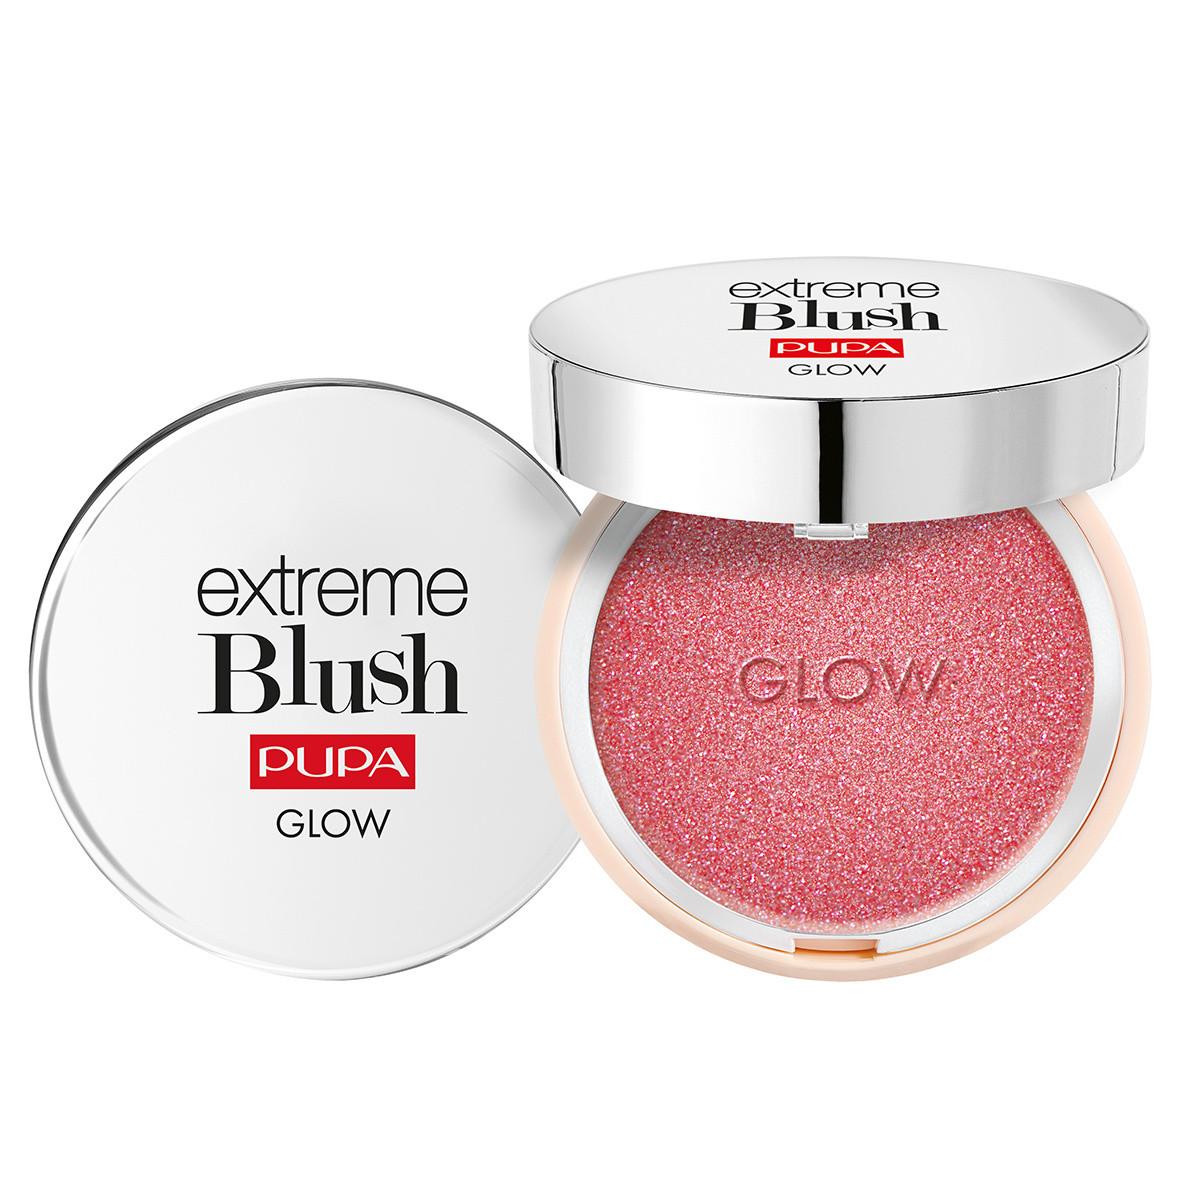 Pupa extreme blush glow - 200, RASPBERRY PINK, large image number 0